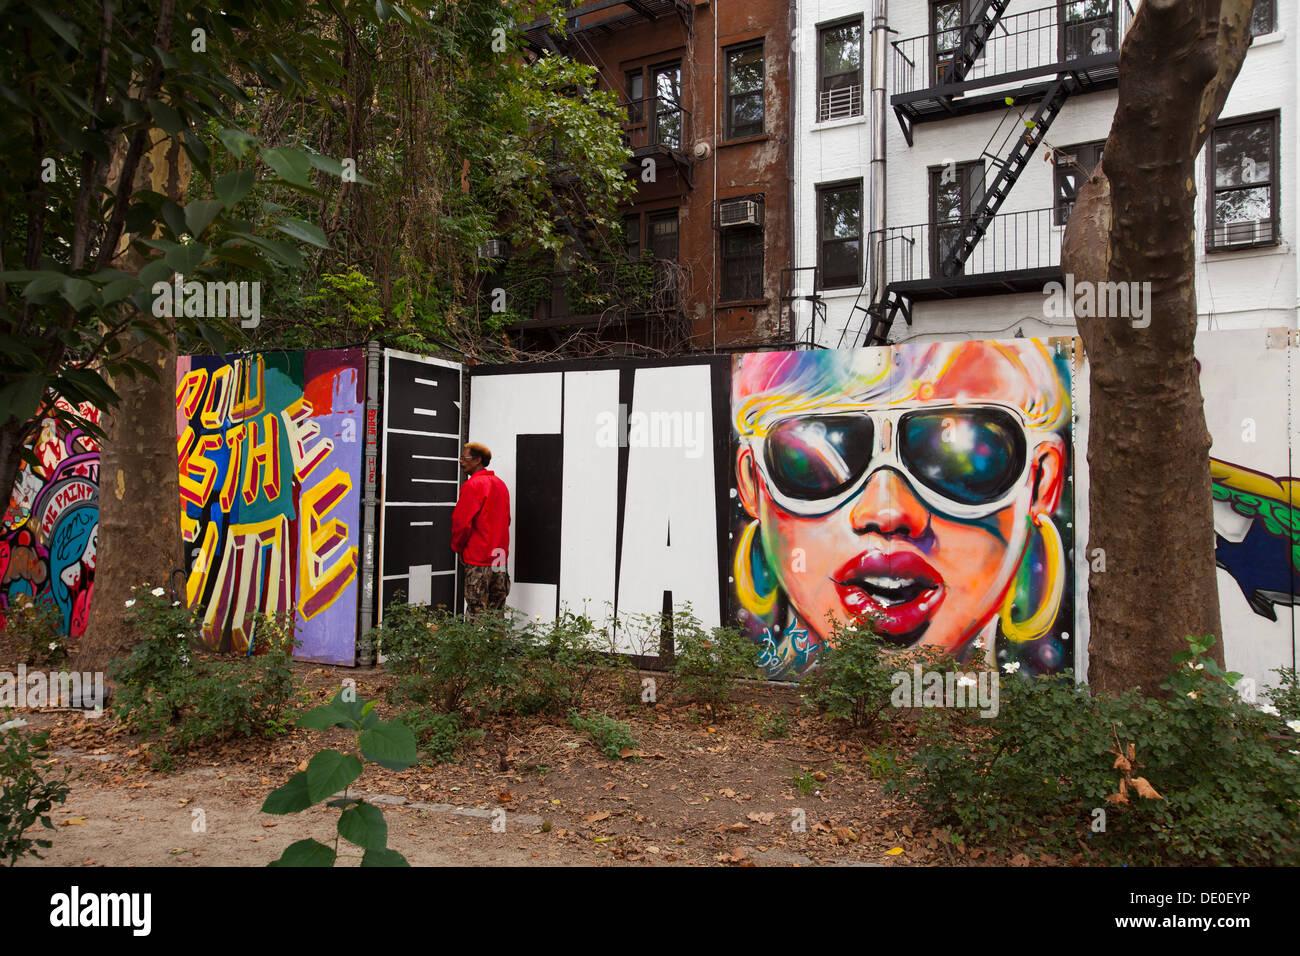 Street art on houston street manhattan new york united states of america